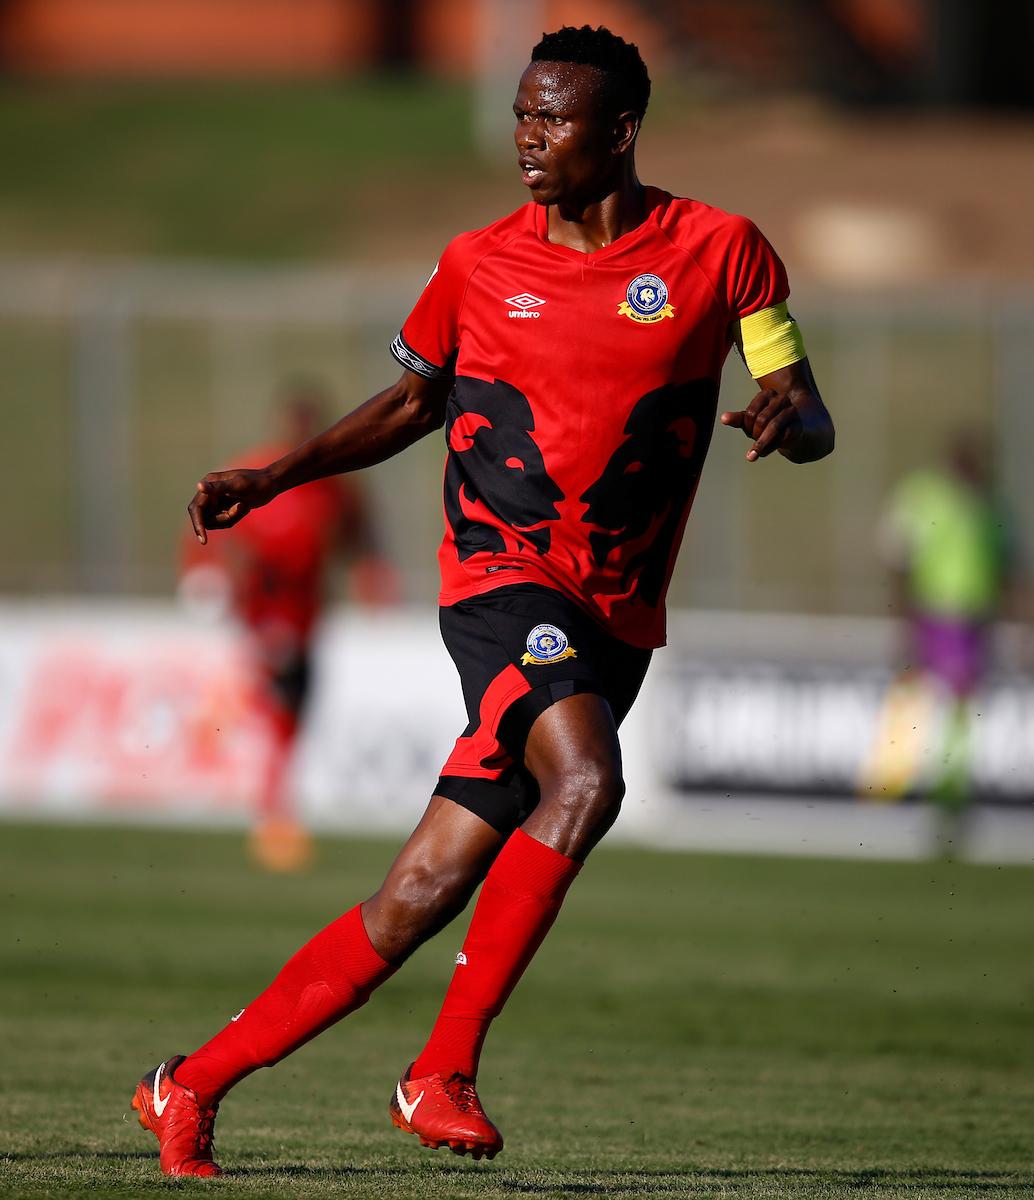 Tshakhuma Tsha Madzivhandila defender Tsepho Makgoga